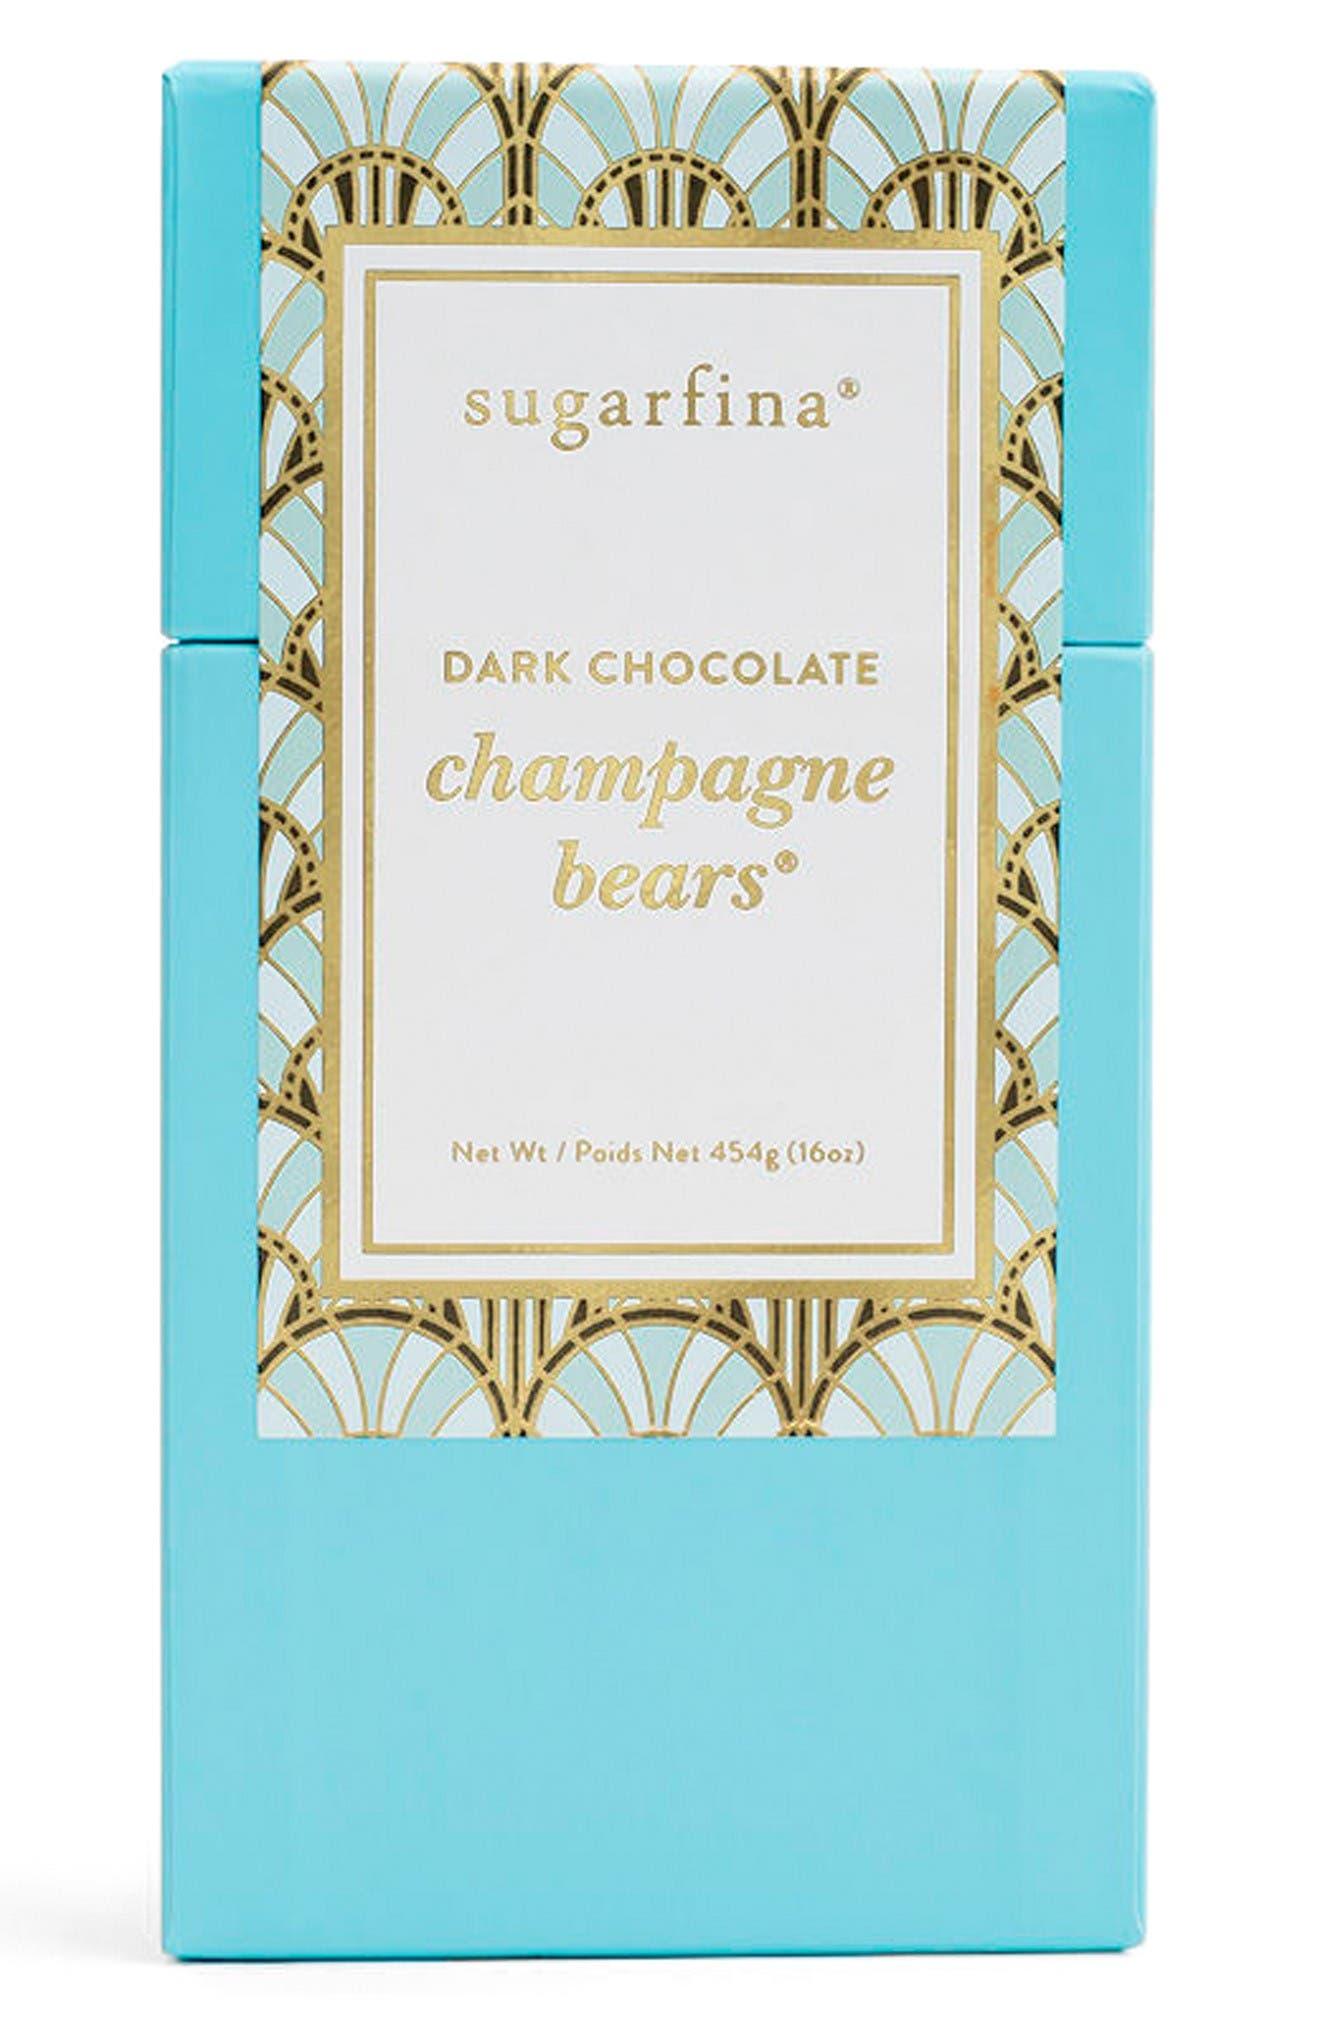 Alternate Image 1 Selected - sugarfina Dark Chocolate Champagne Bears®